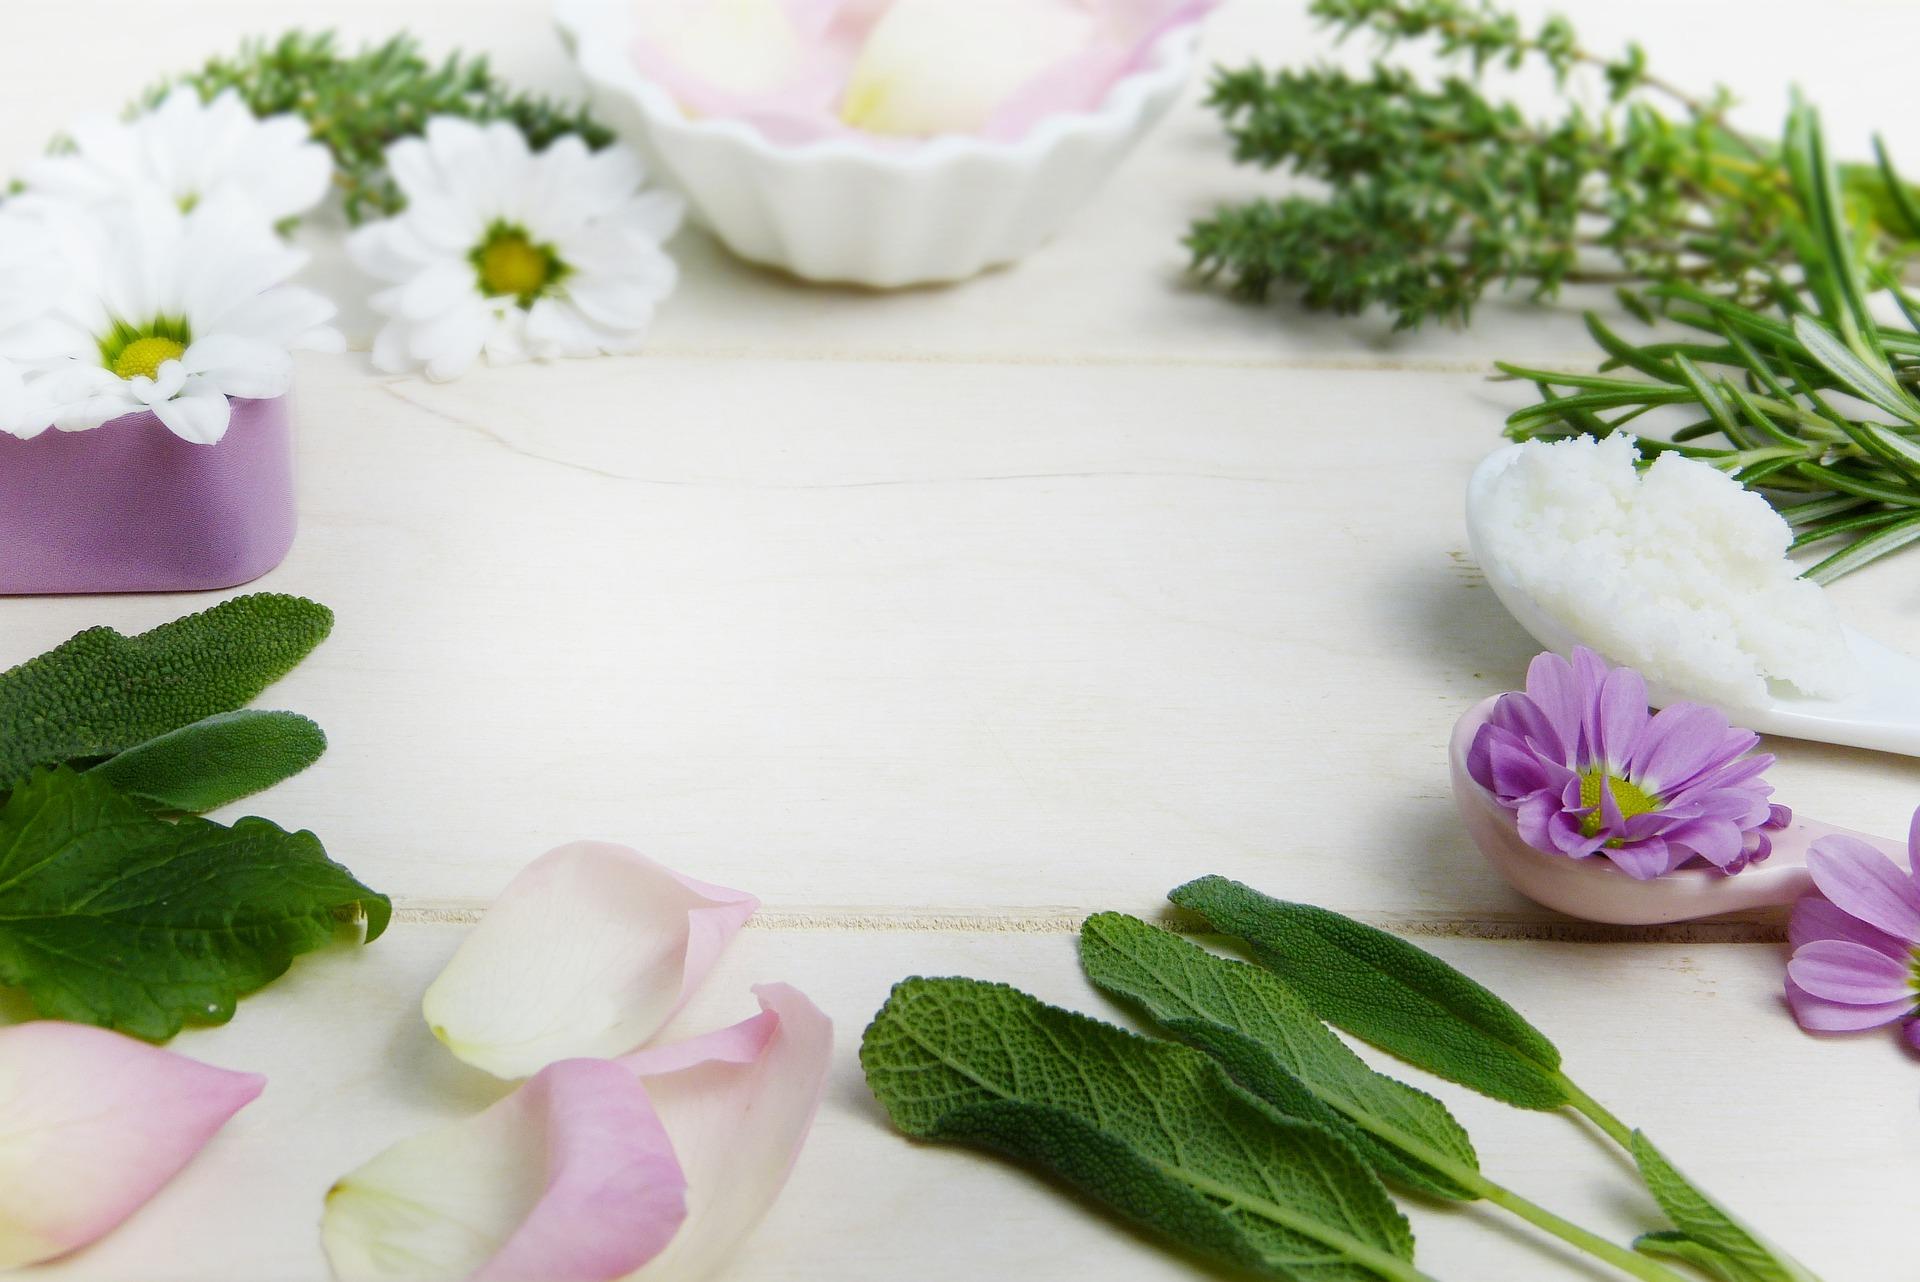 herbs-3141838_1920